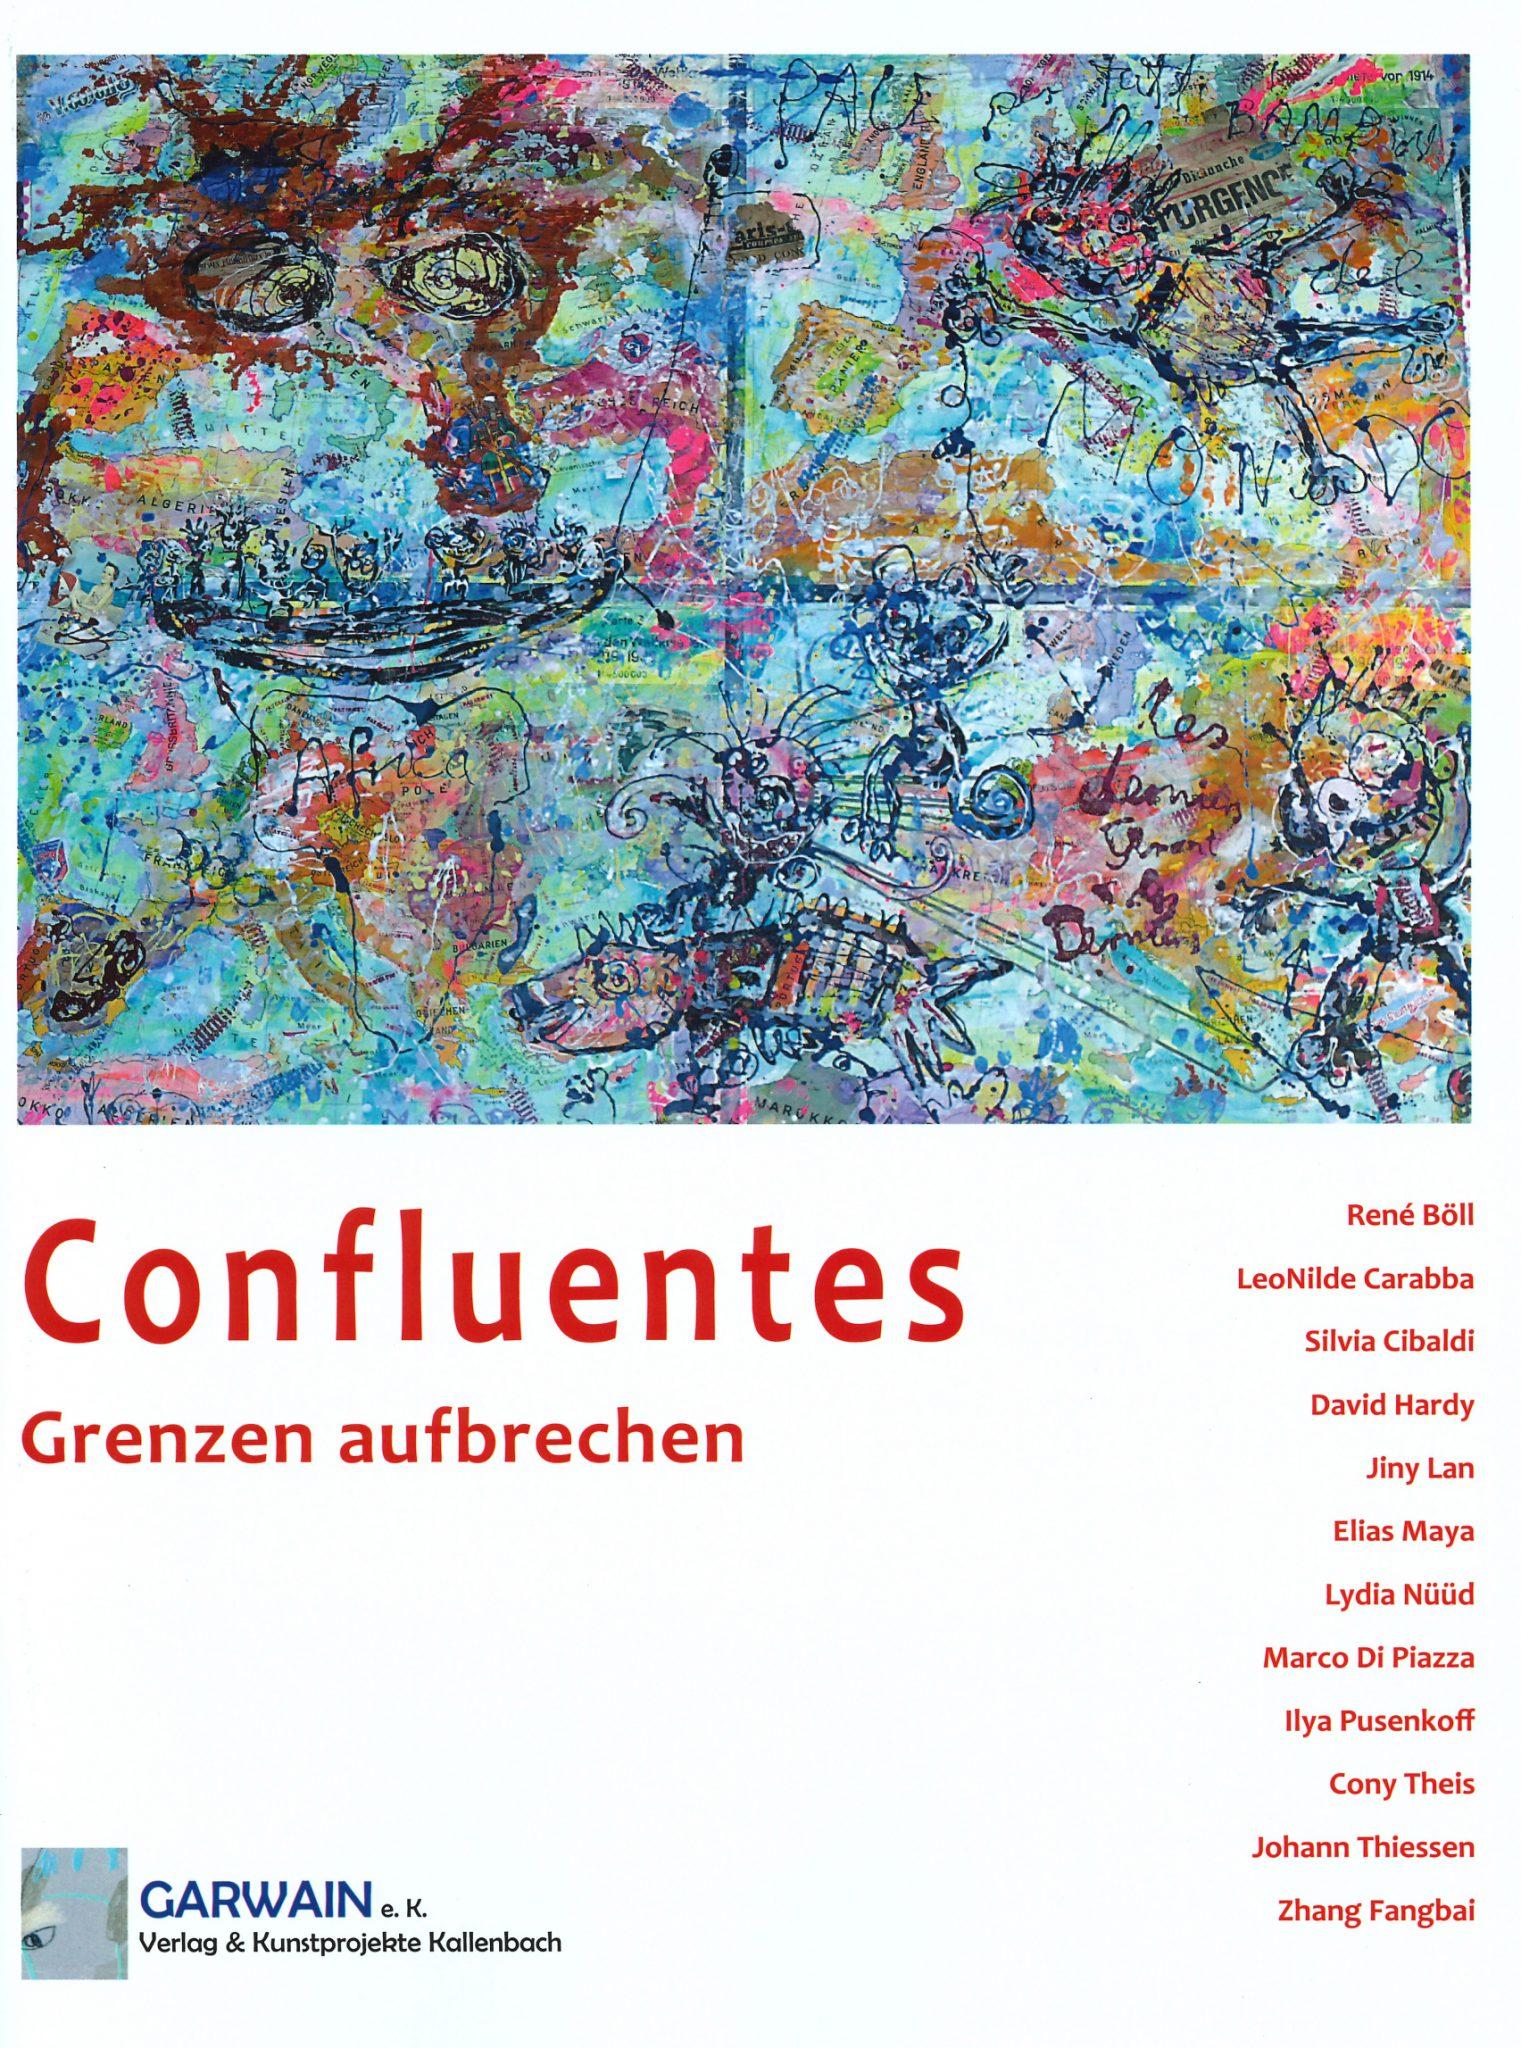 Shop Katalog Cover Buch